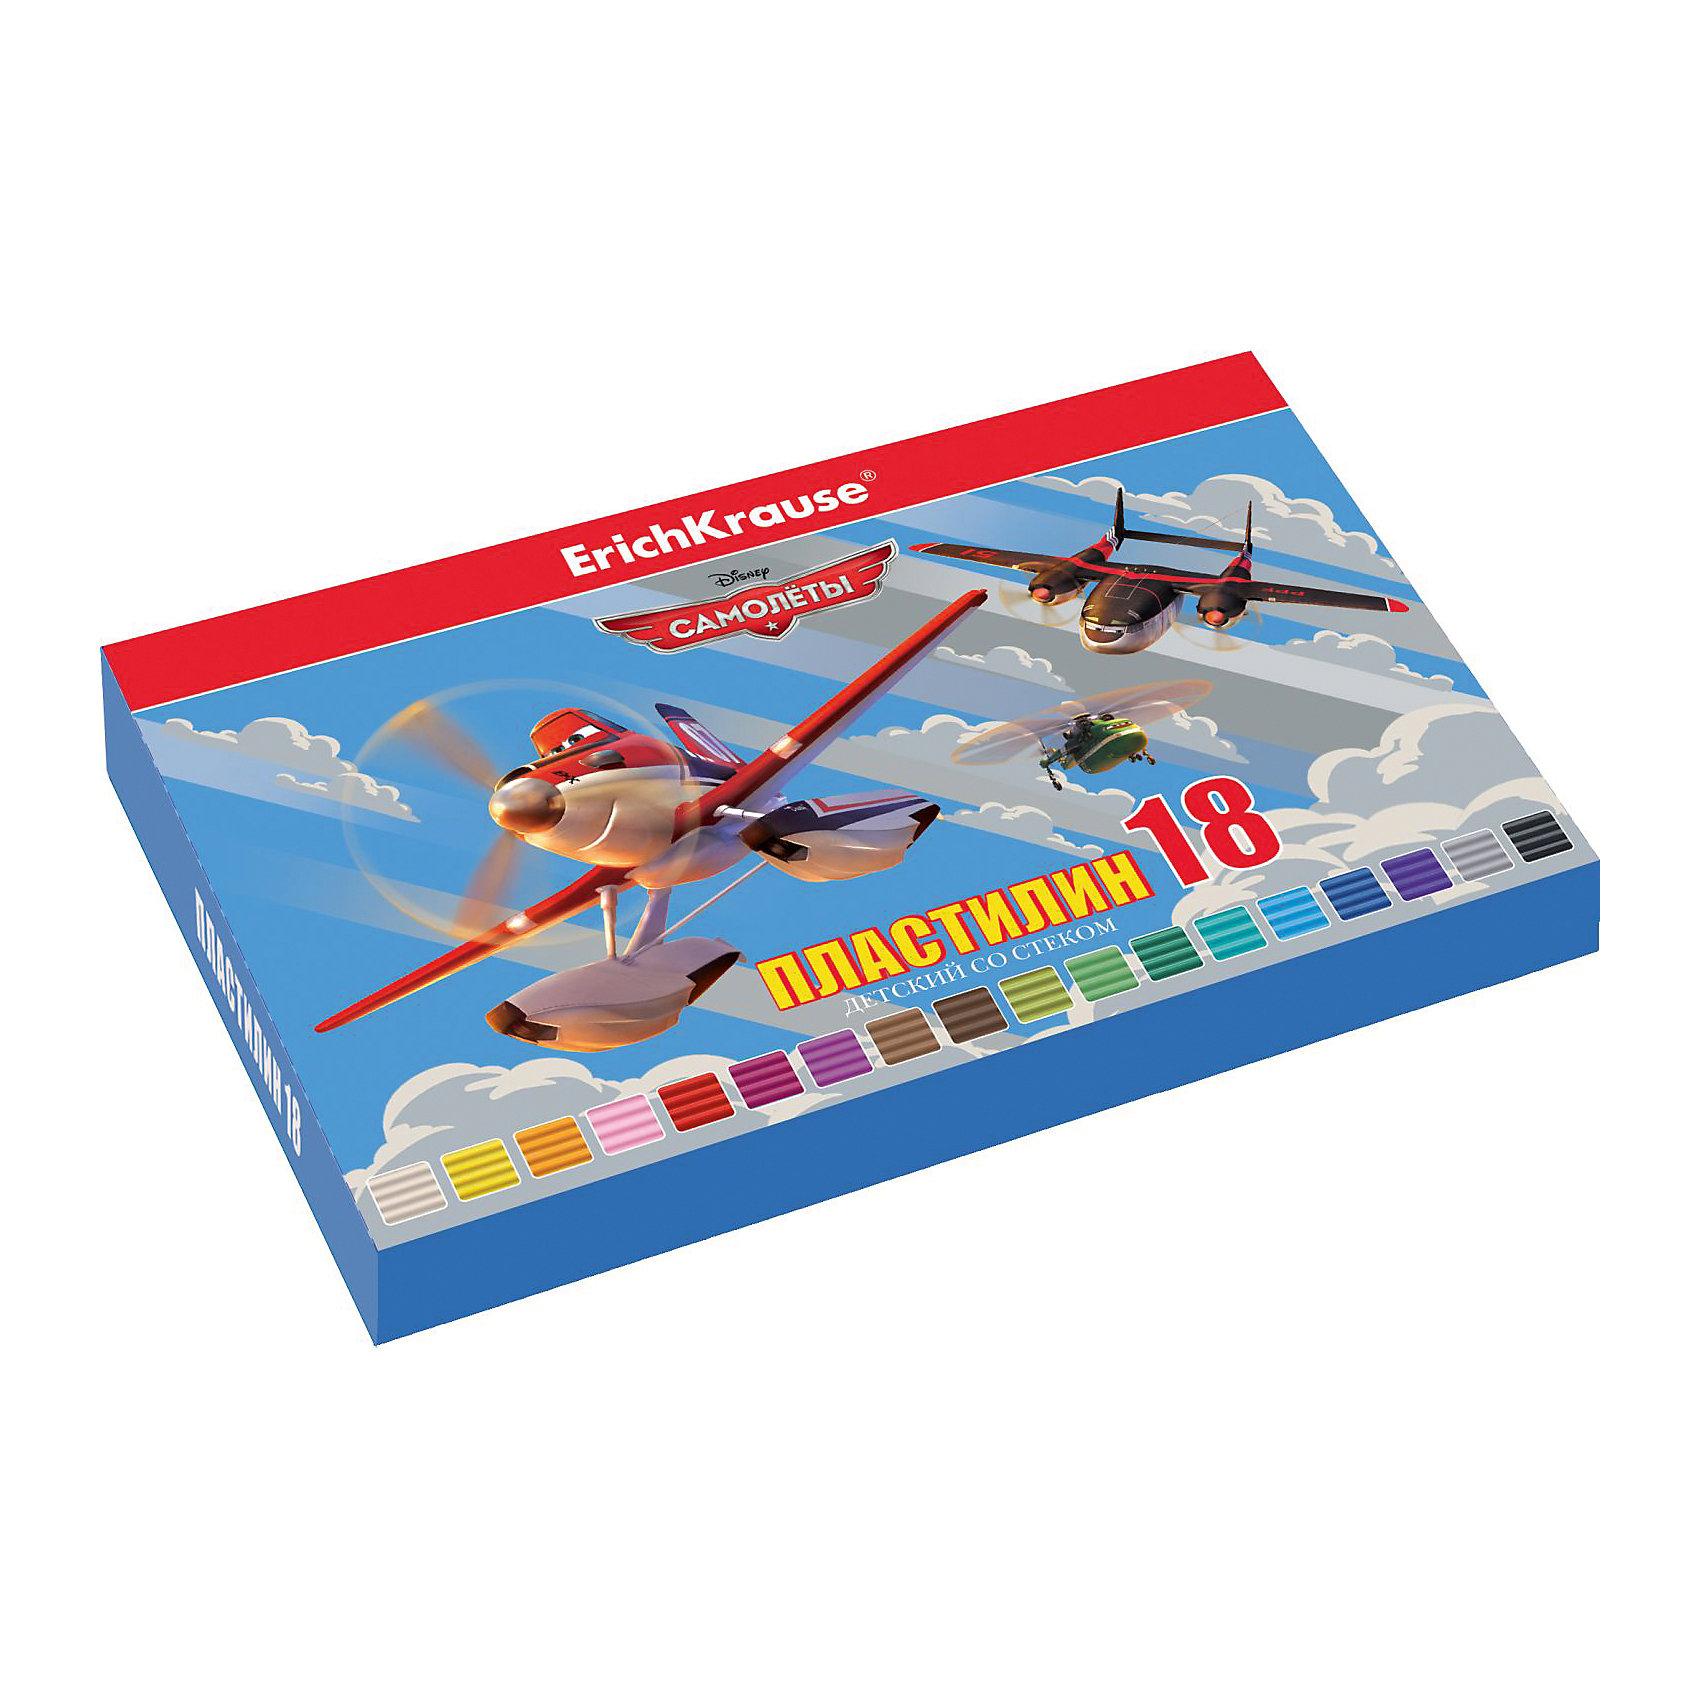 Пластилин 18 цветов Flying Planes, 324г, со стекомПластилин 18 цветов Flying Planes/324г, со стеком, в коробке<br><br>Ширина мм: 225<br>Глубина мм: 143<br>Высота мм: 16<br>Вес г: 381<br>Возраст от месяцев: 60<br>Возраст до месяцев: 216<br>Пол: Женский<br>Возраст: Детский<br>SKU: 5409302